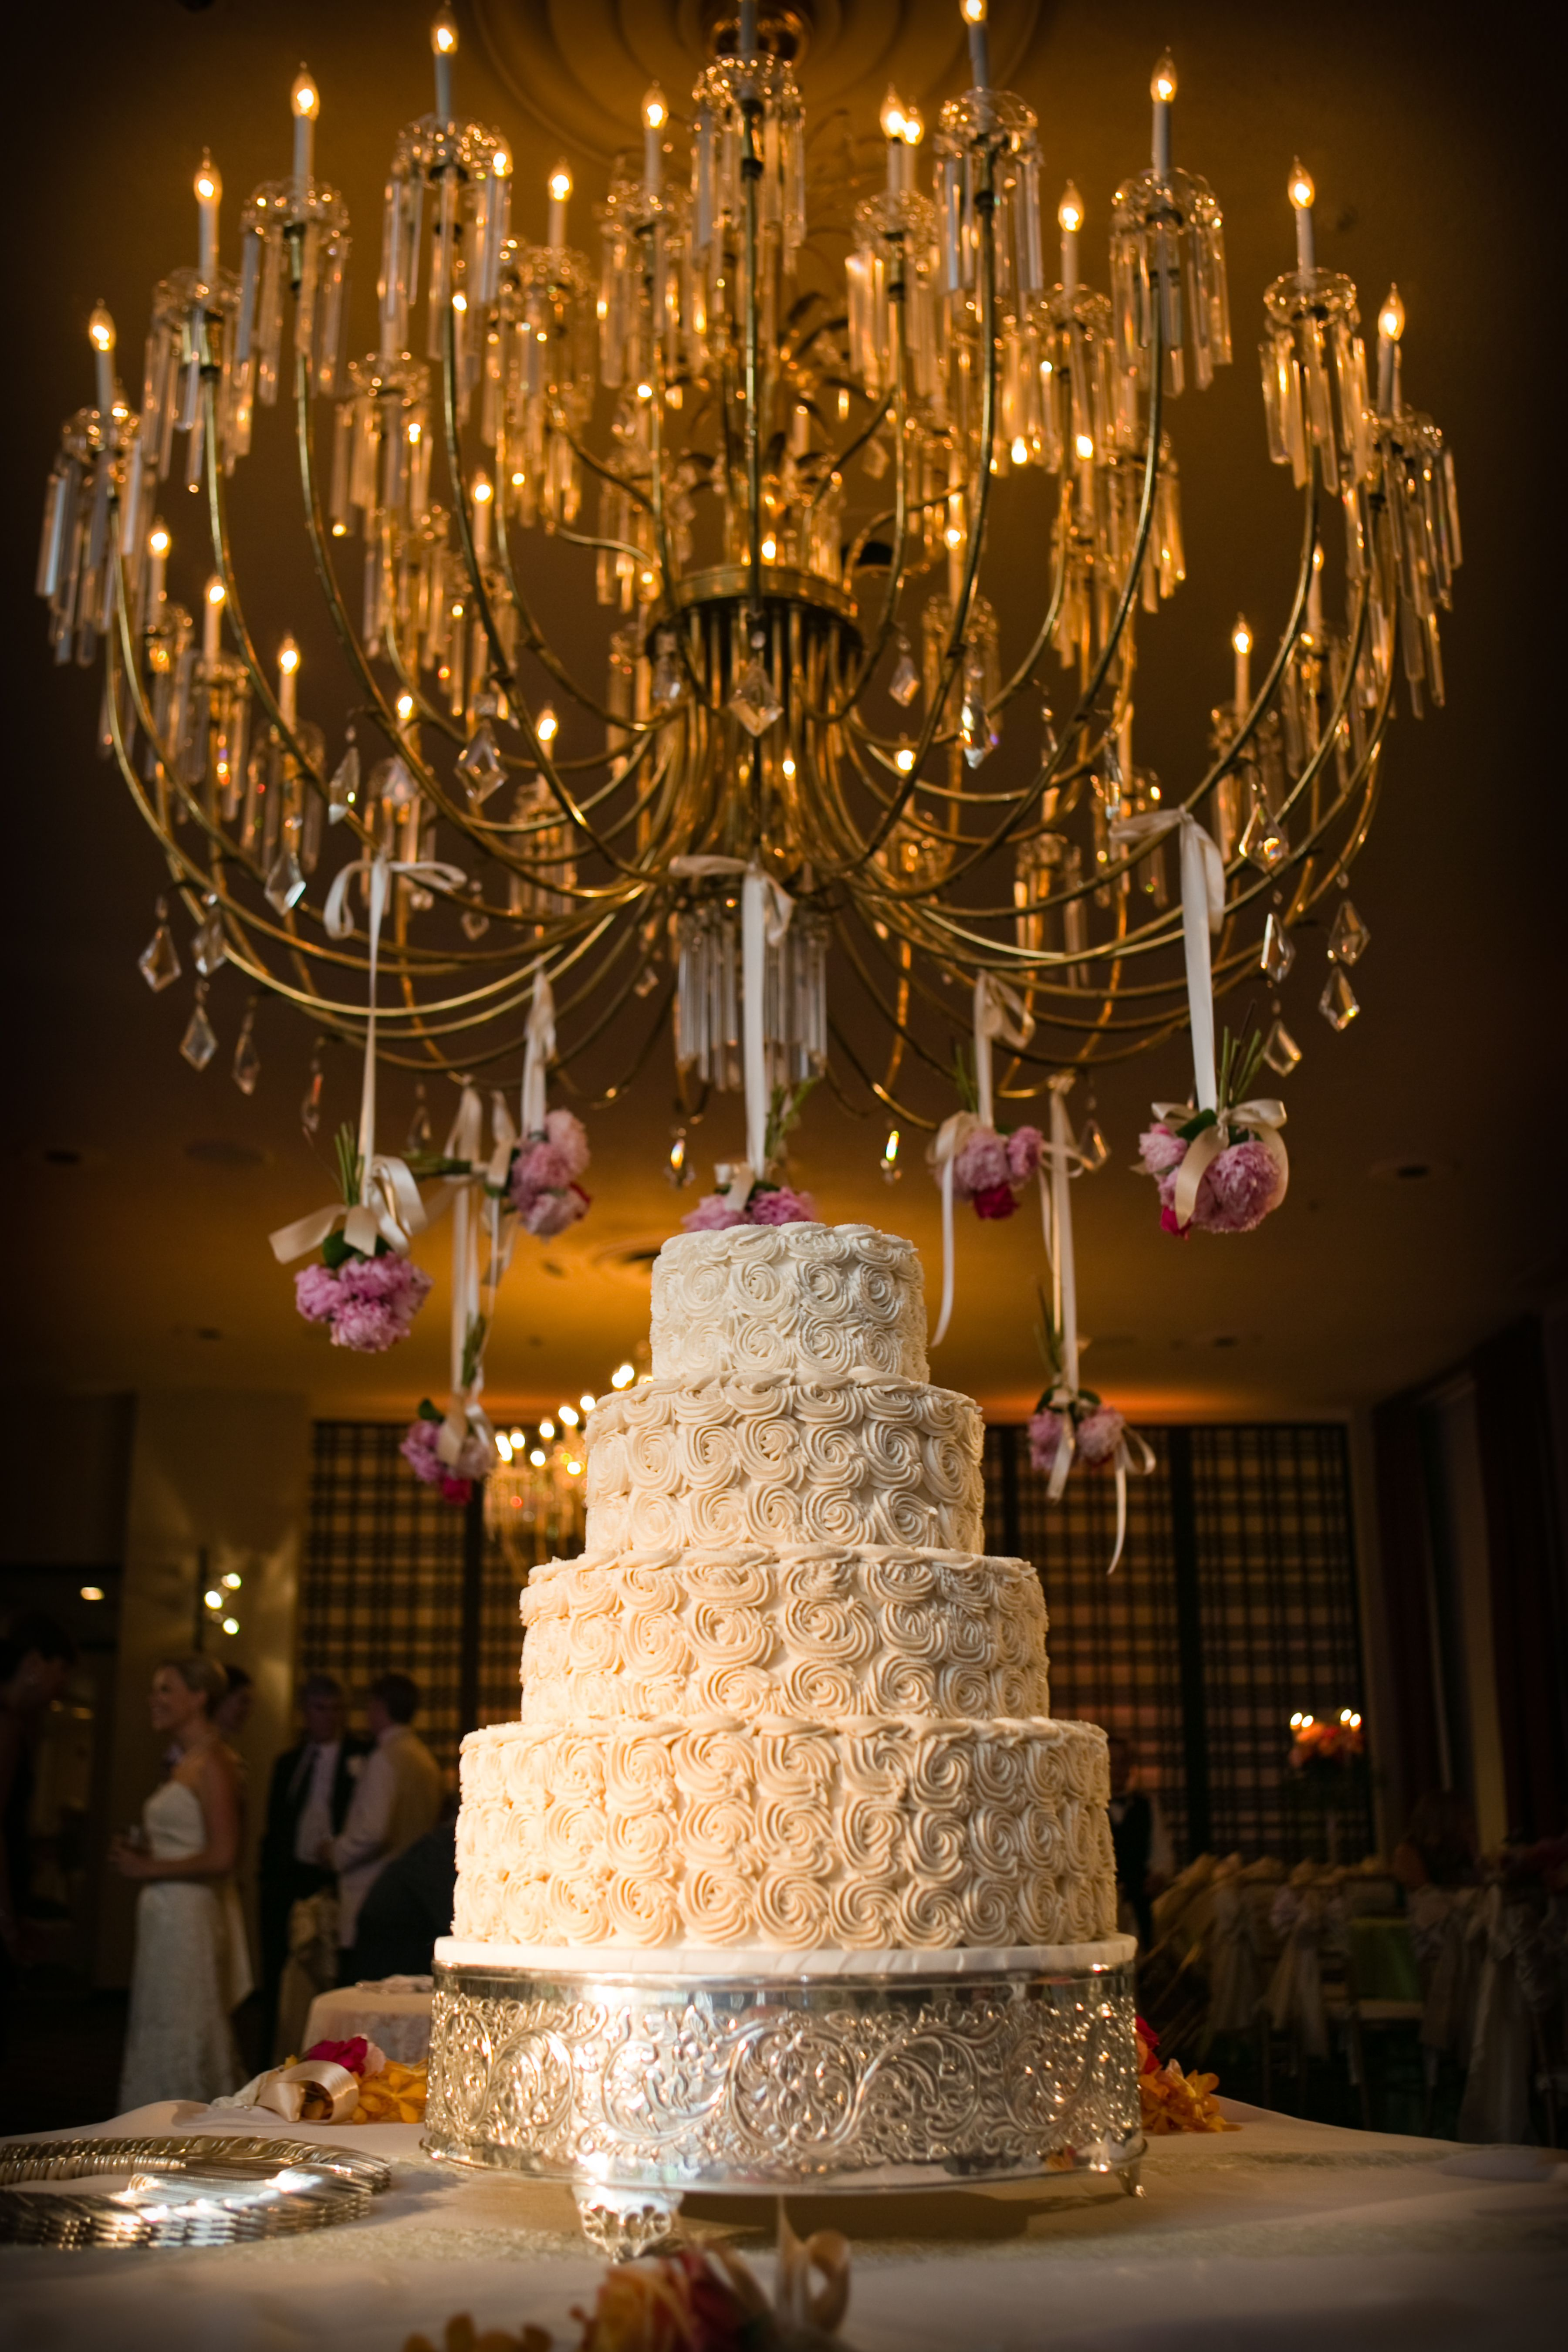 Rosette Wedding Cake by Creme de la Creme in Fort Worth